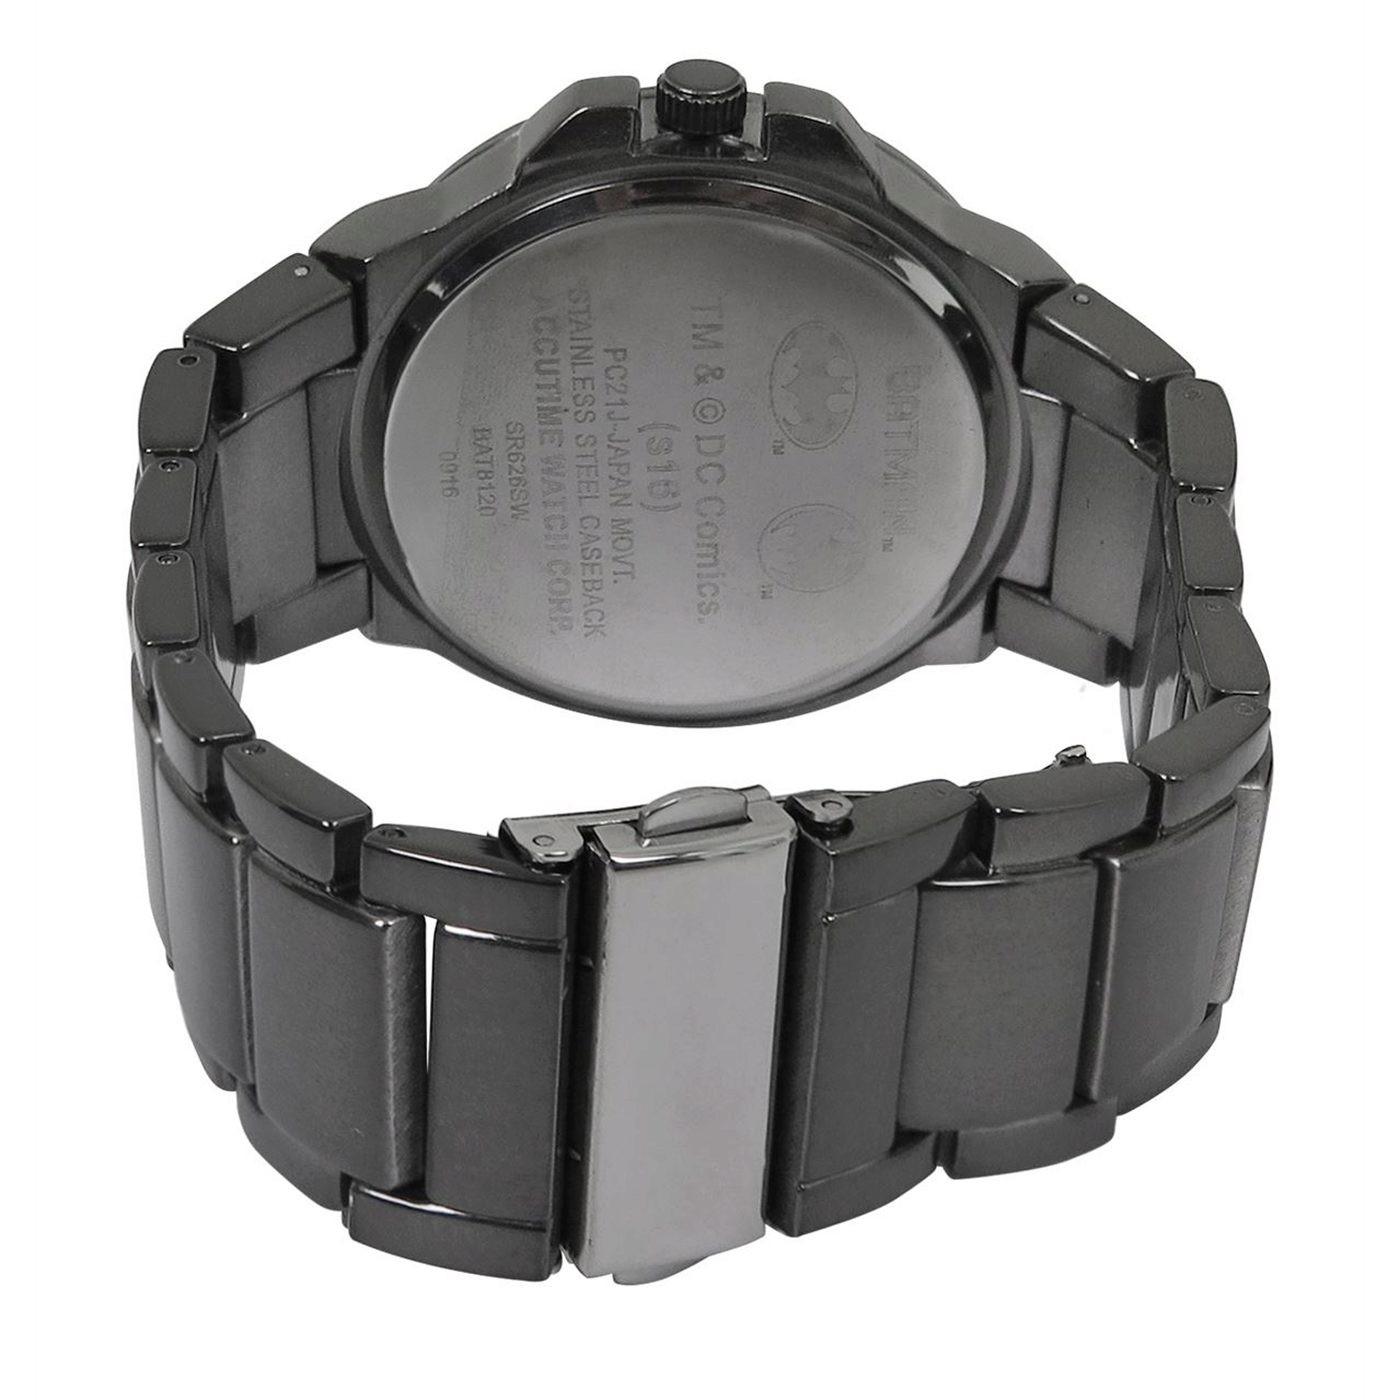 Batman Classic Symbol Watch with Metal Band